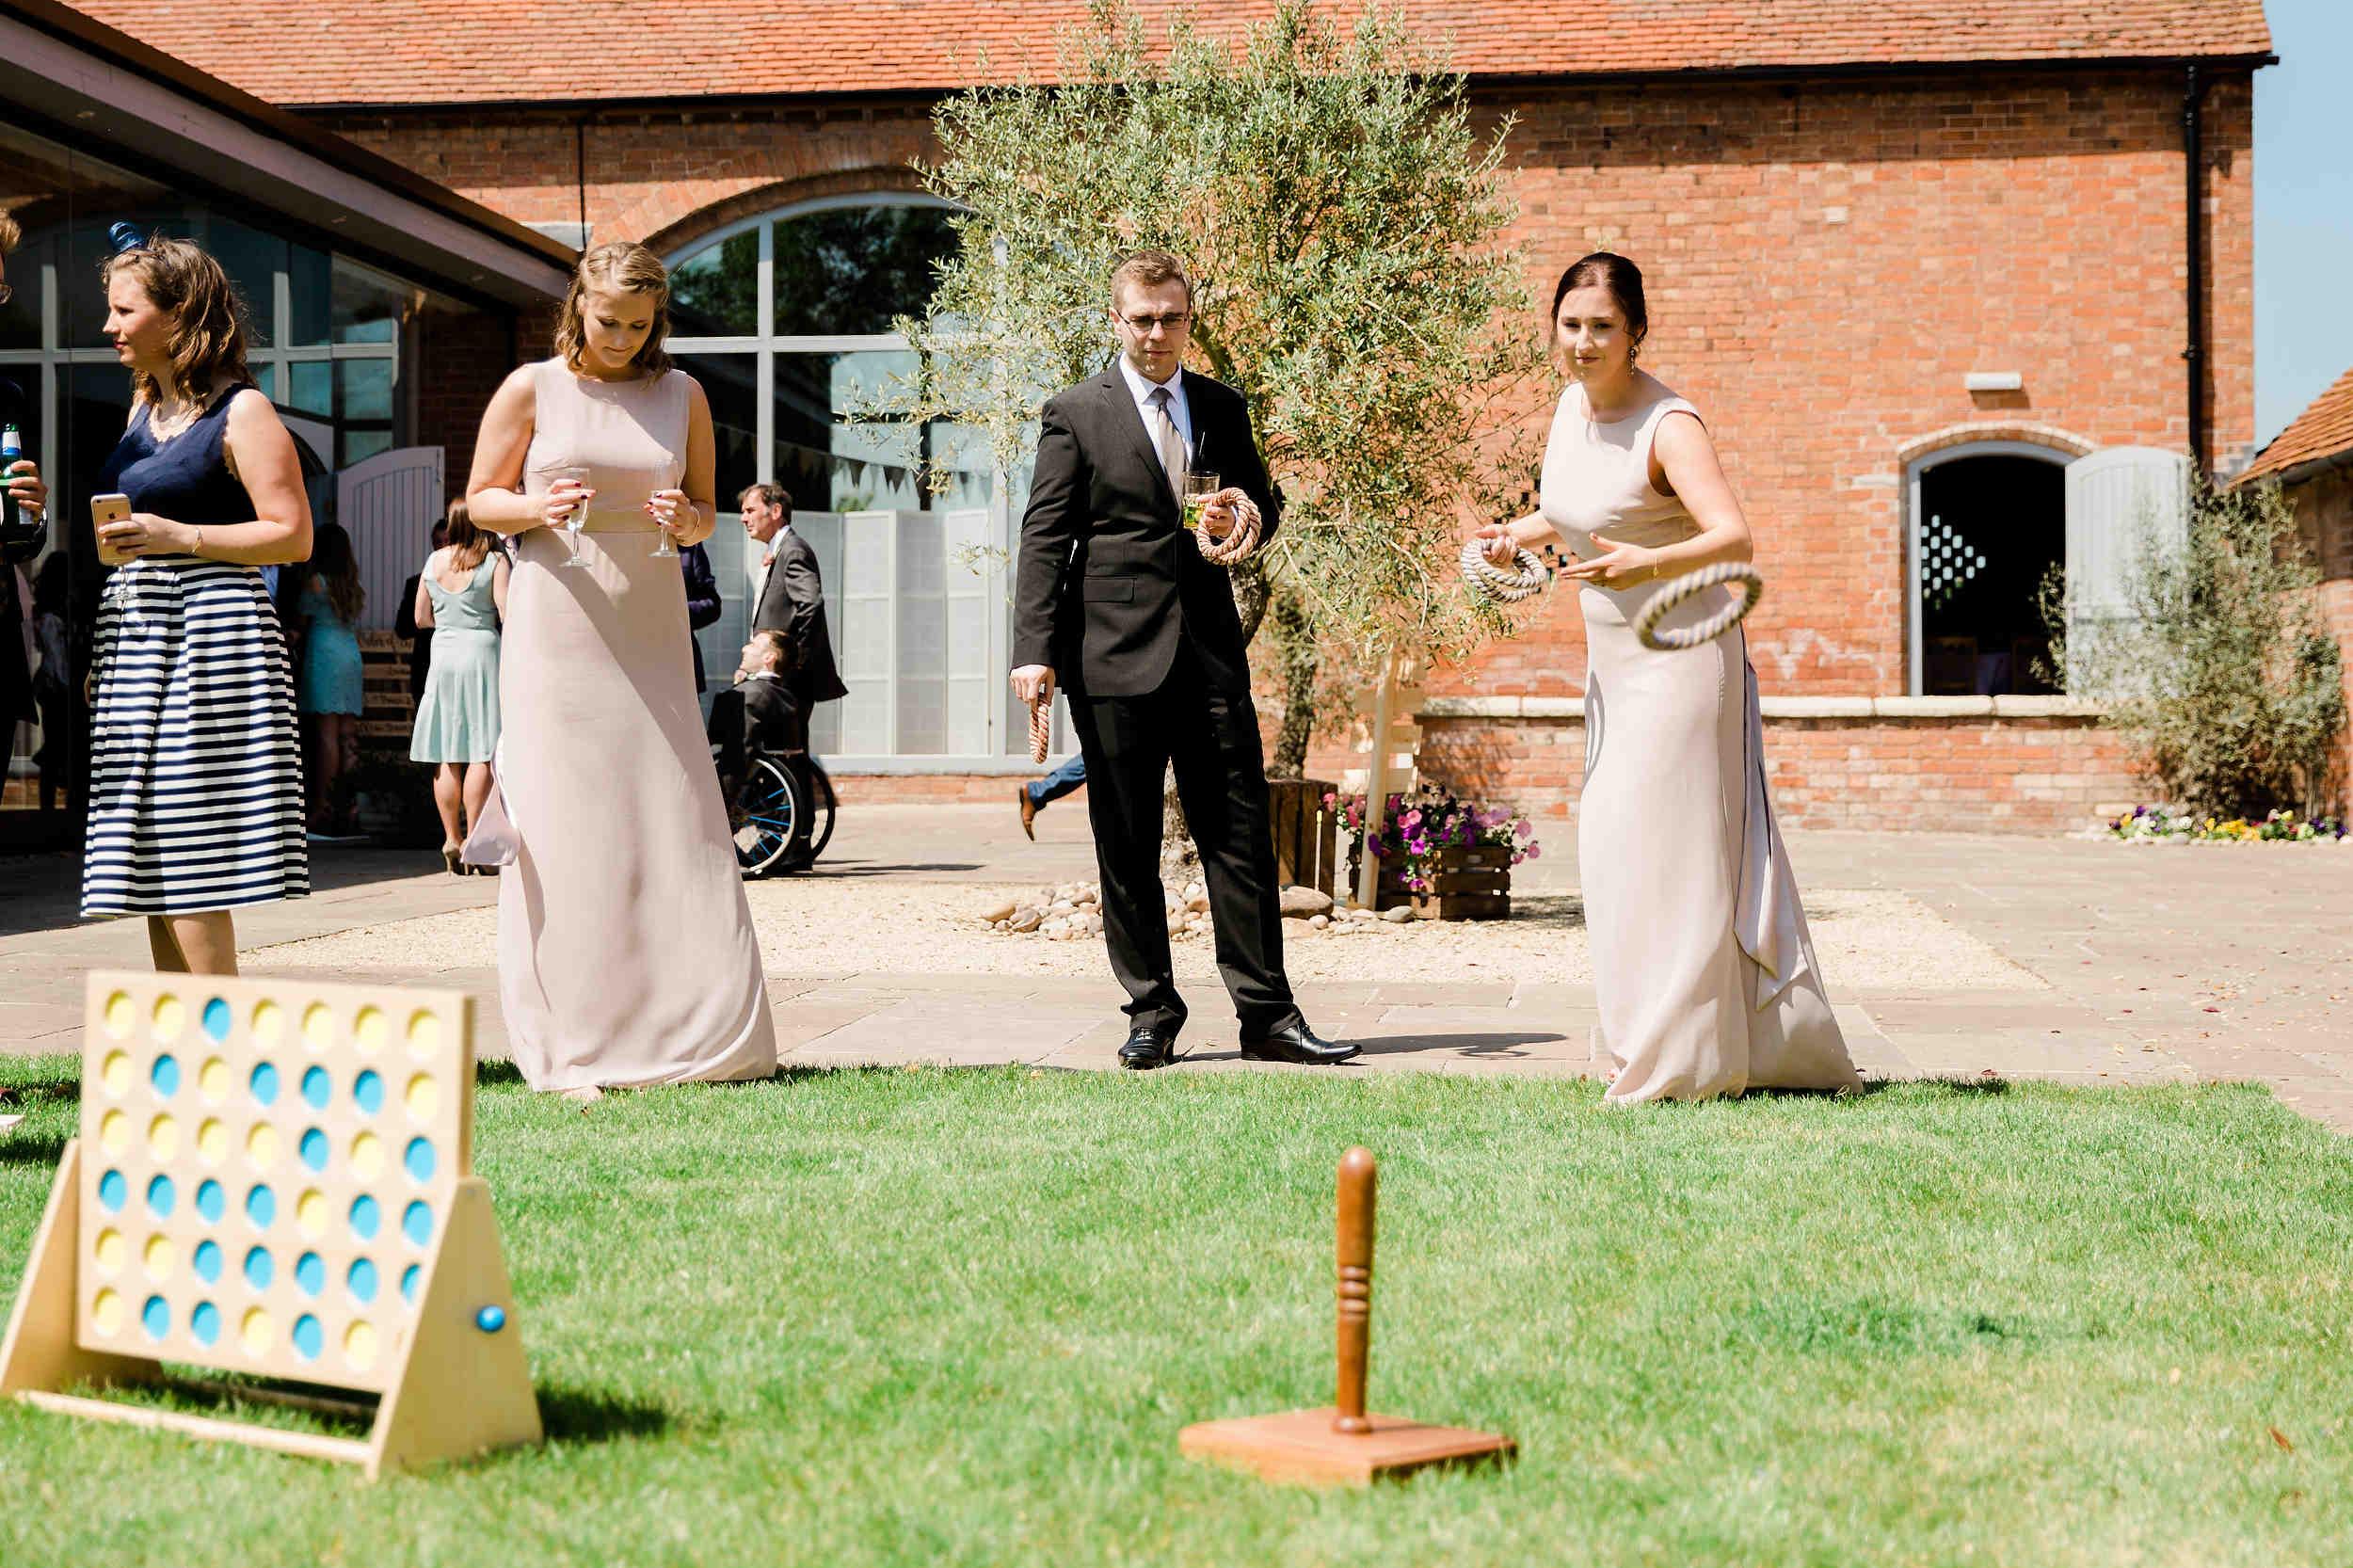 Garden game stick and hoop wedding swallows nest